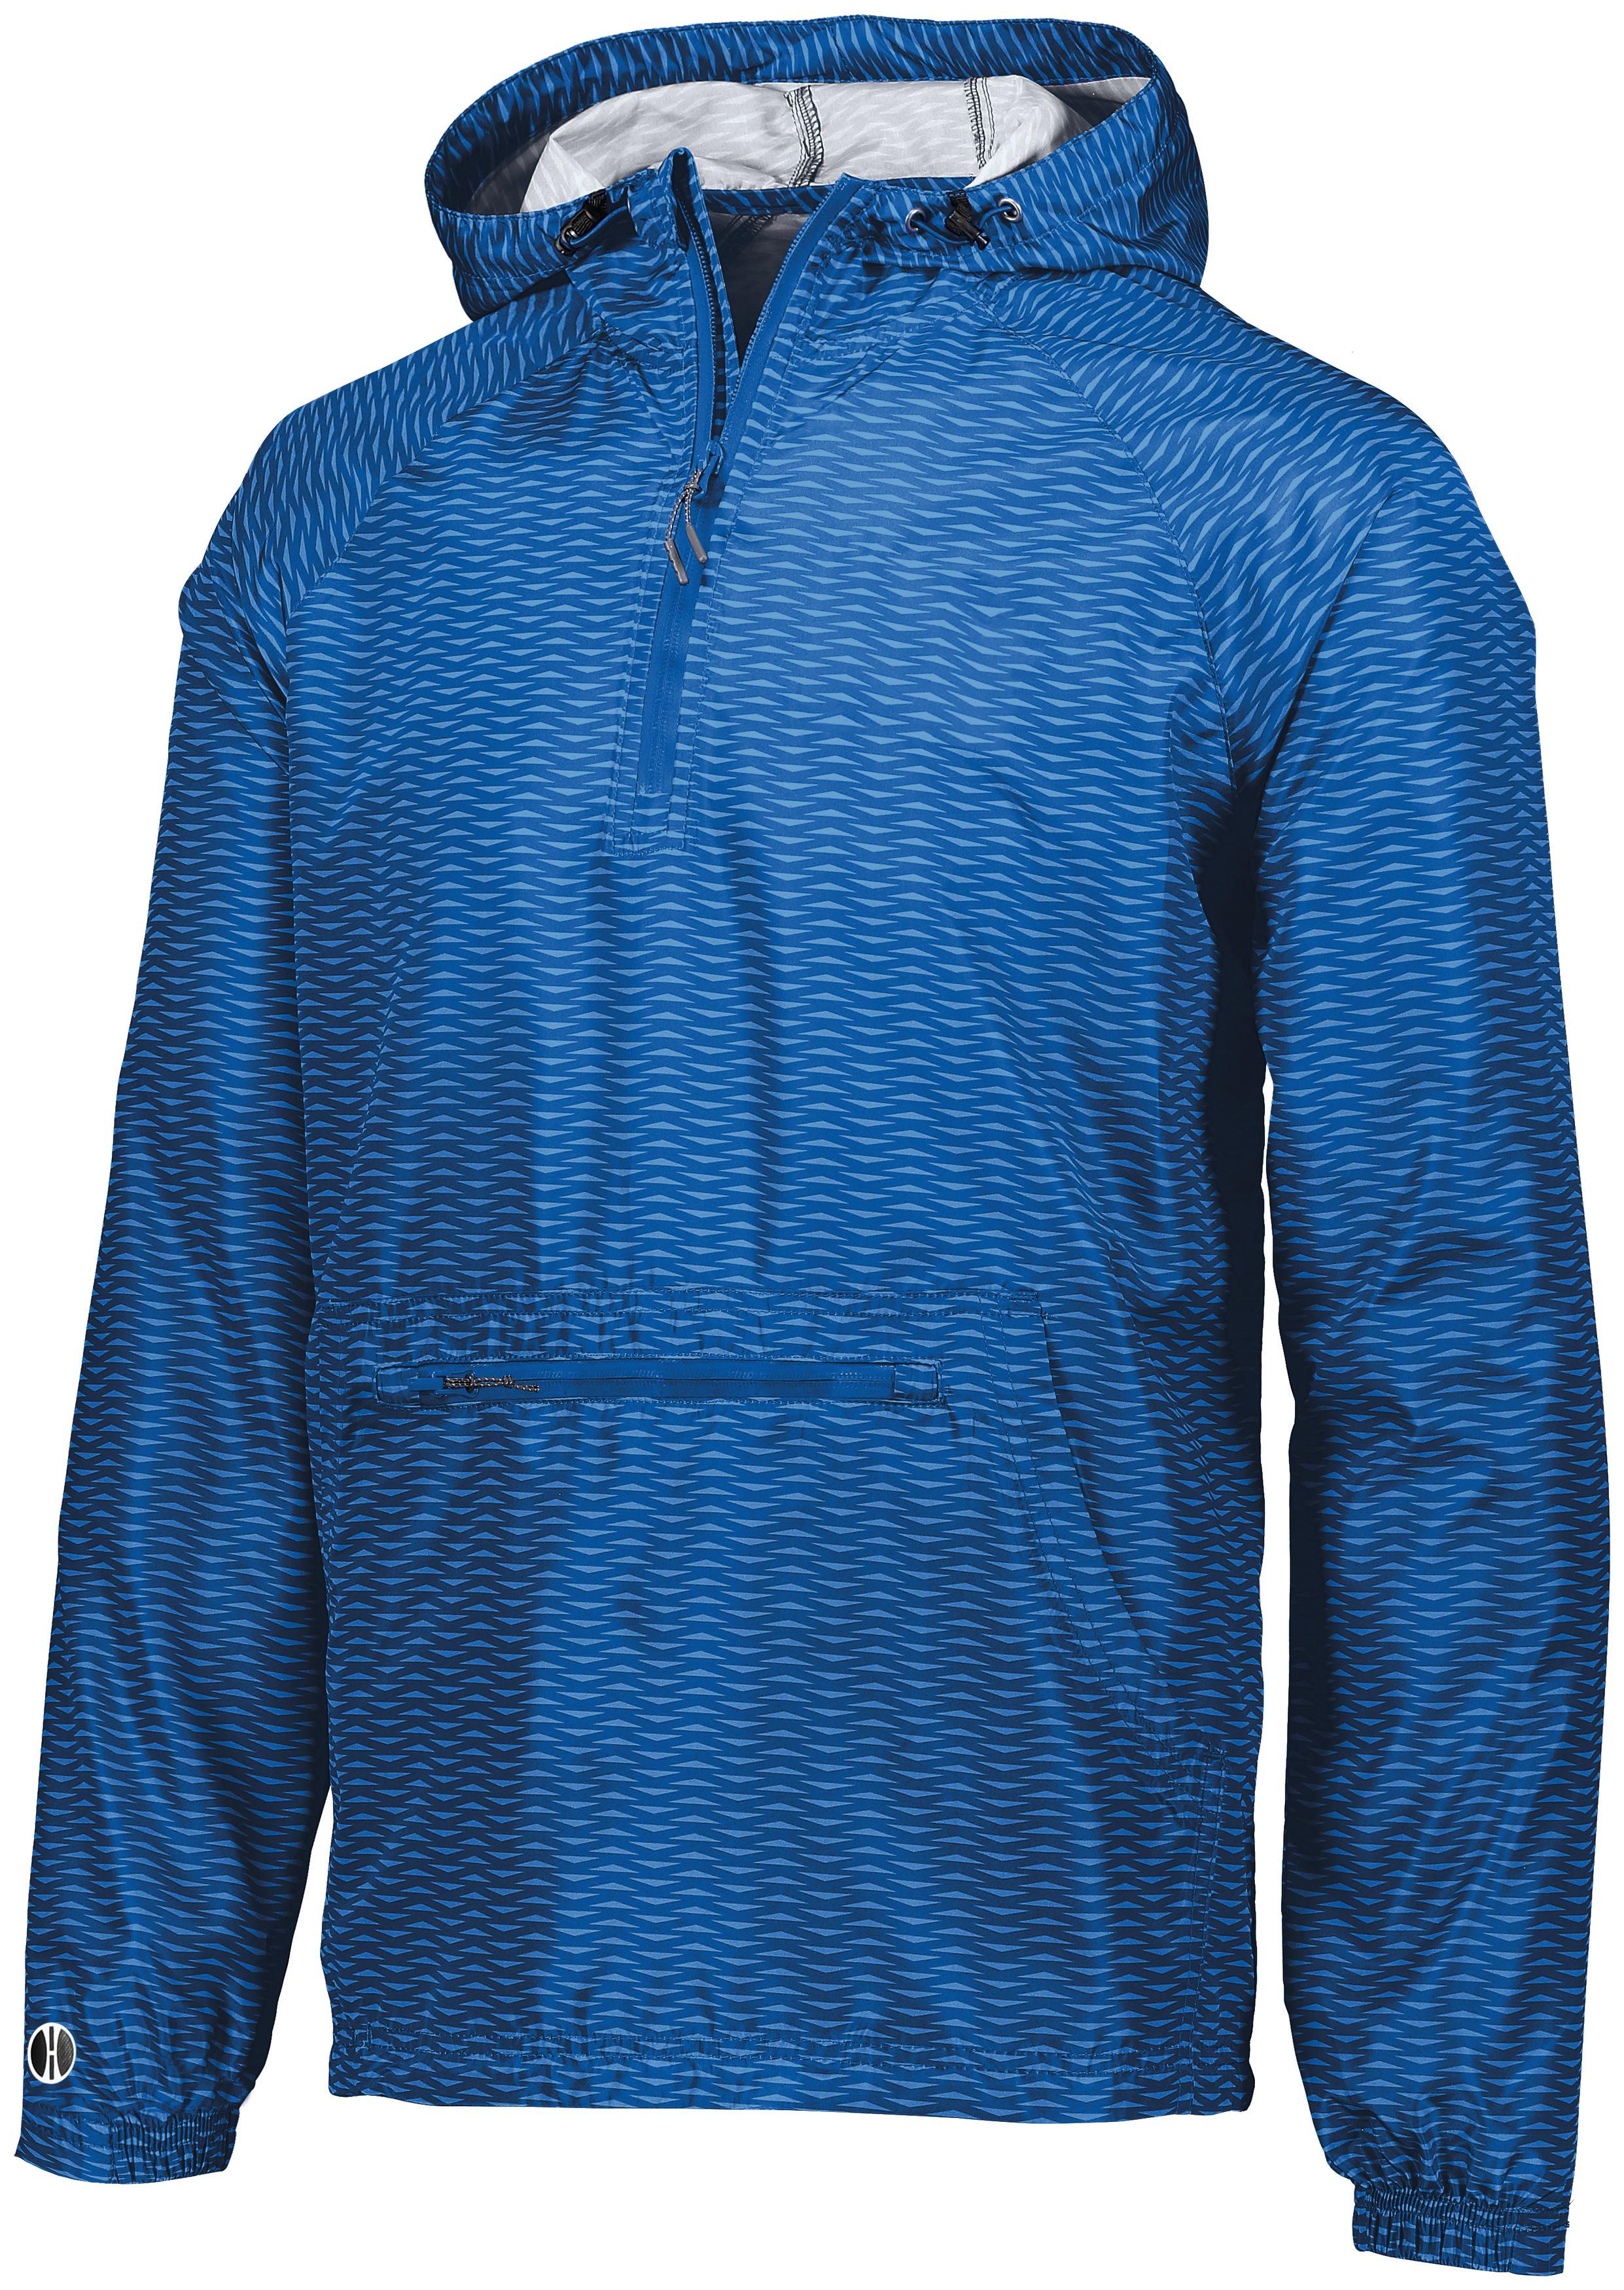 Range Packable Pullover - ROYAL